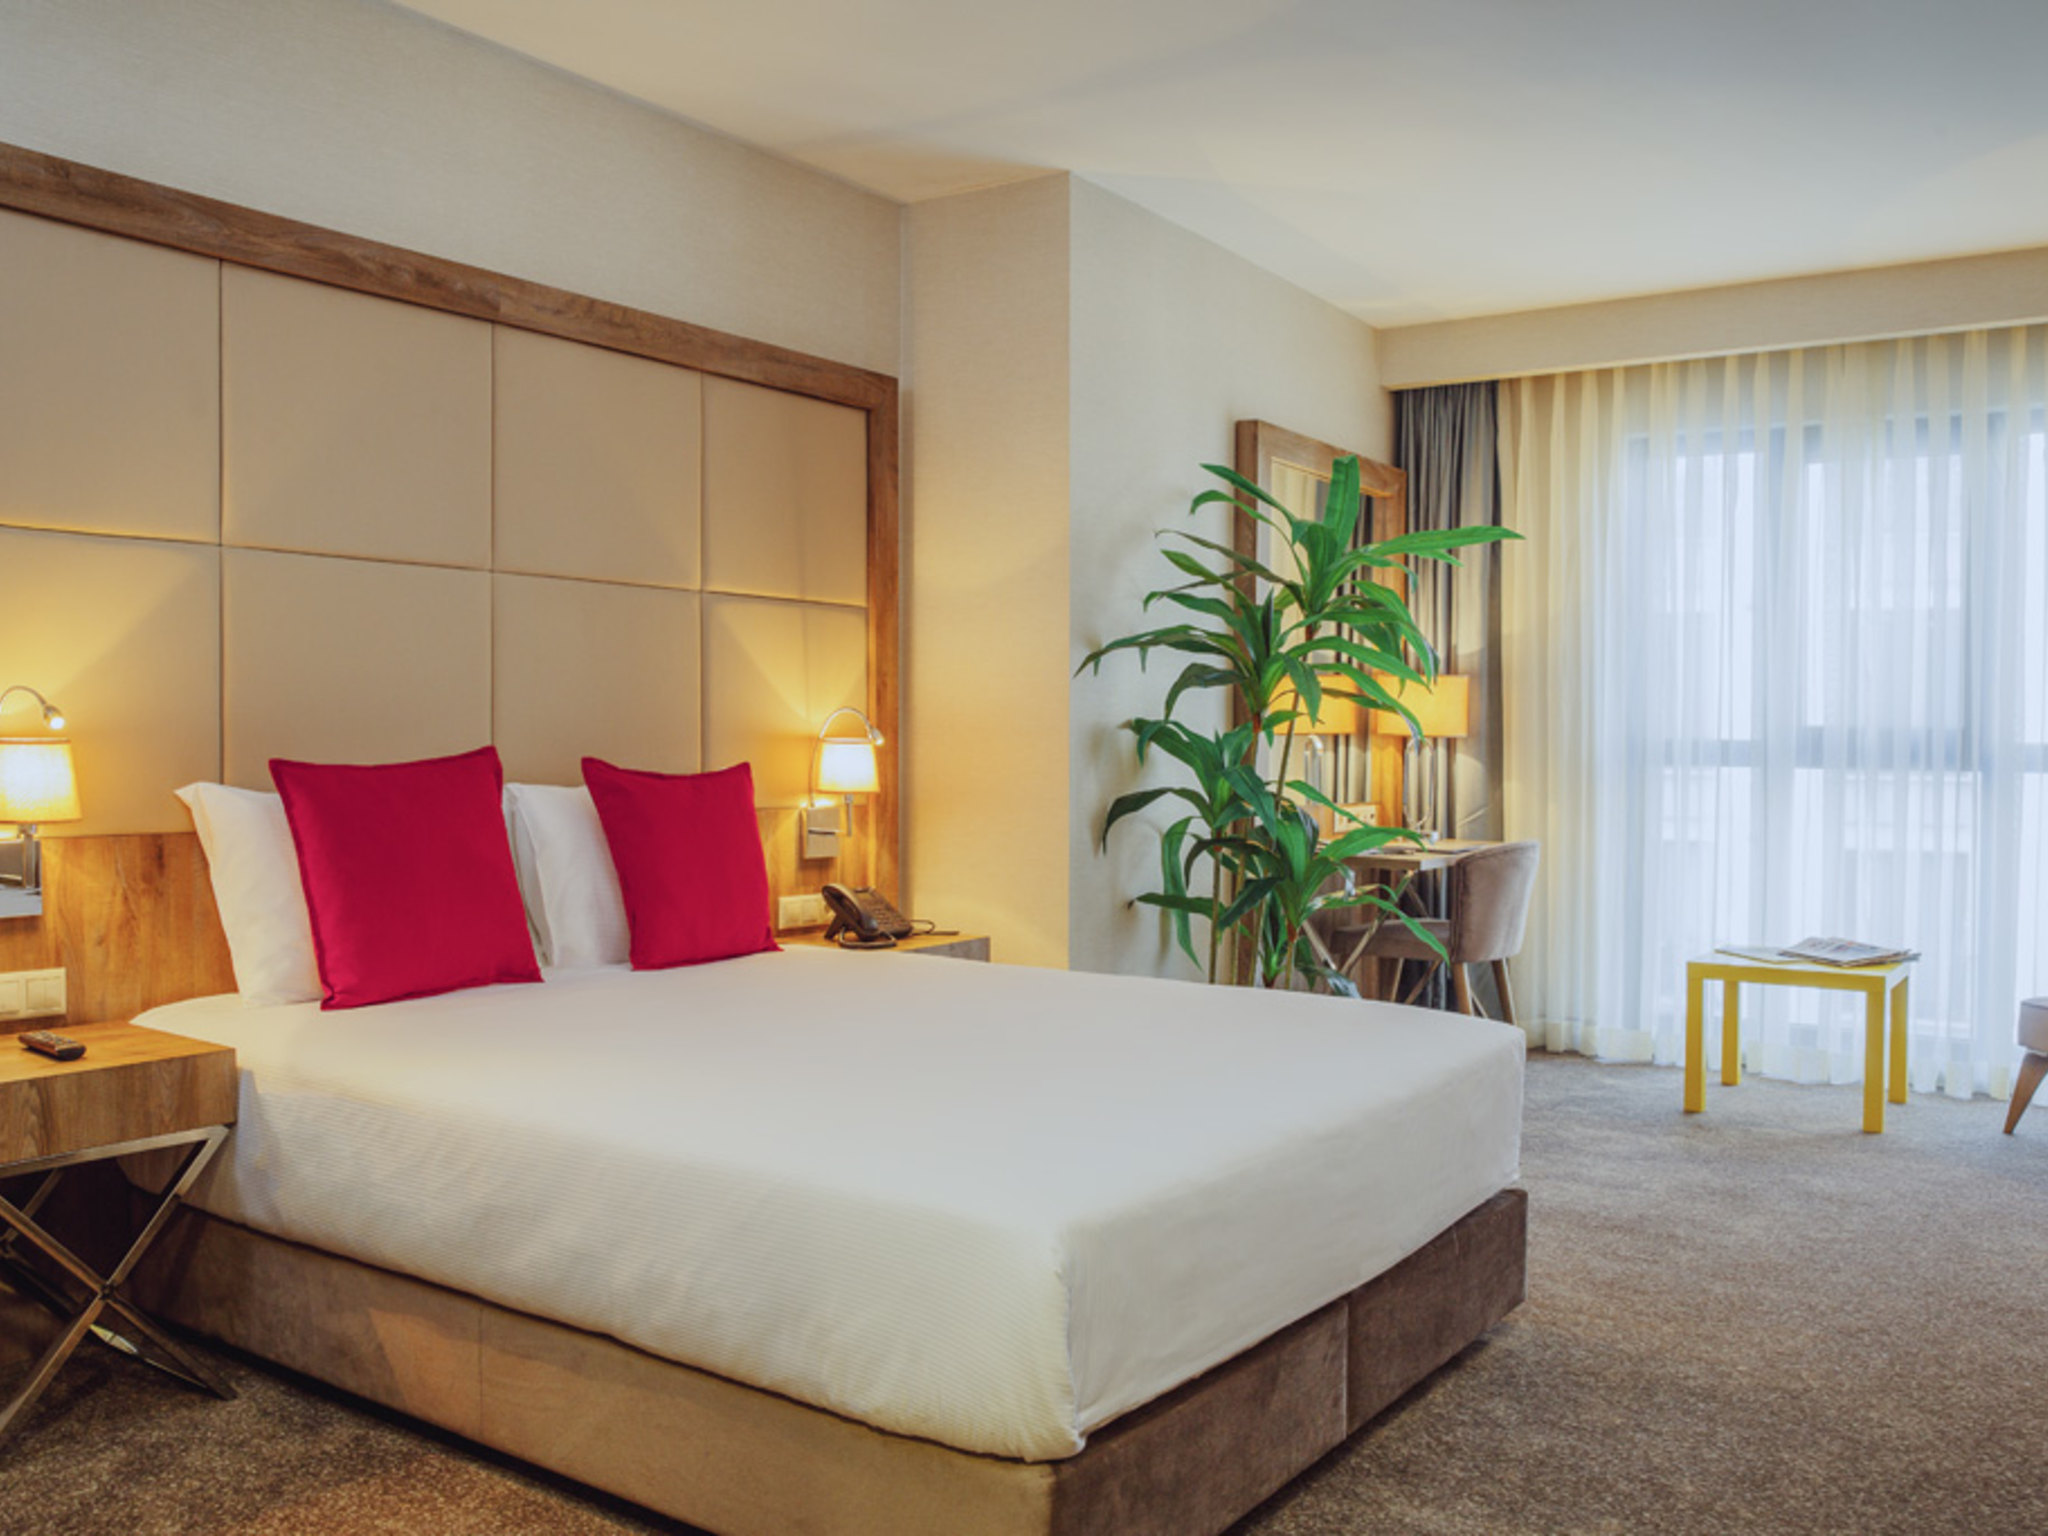 فندق - ibis Styles إسطنبول بومونتي